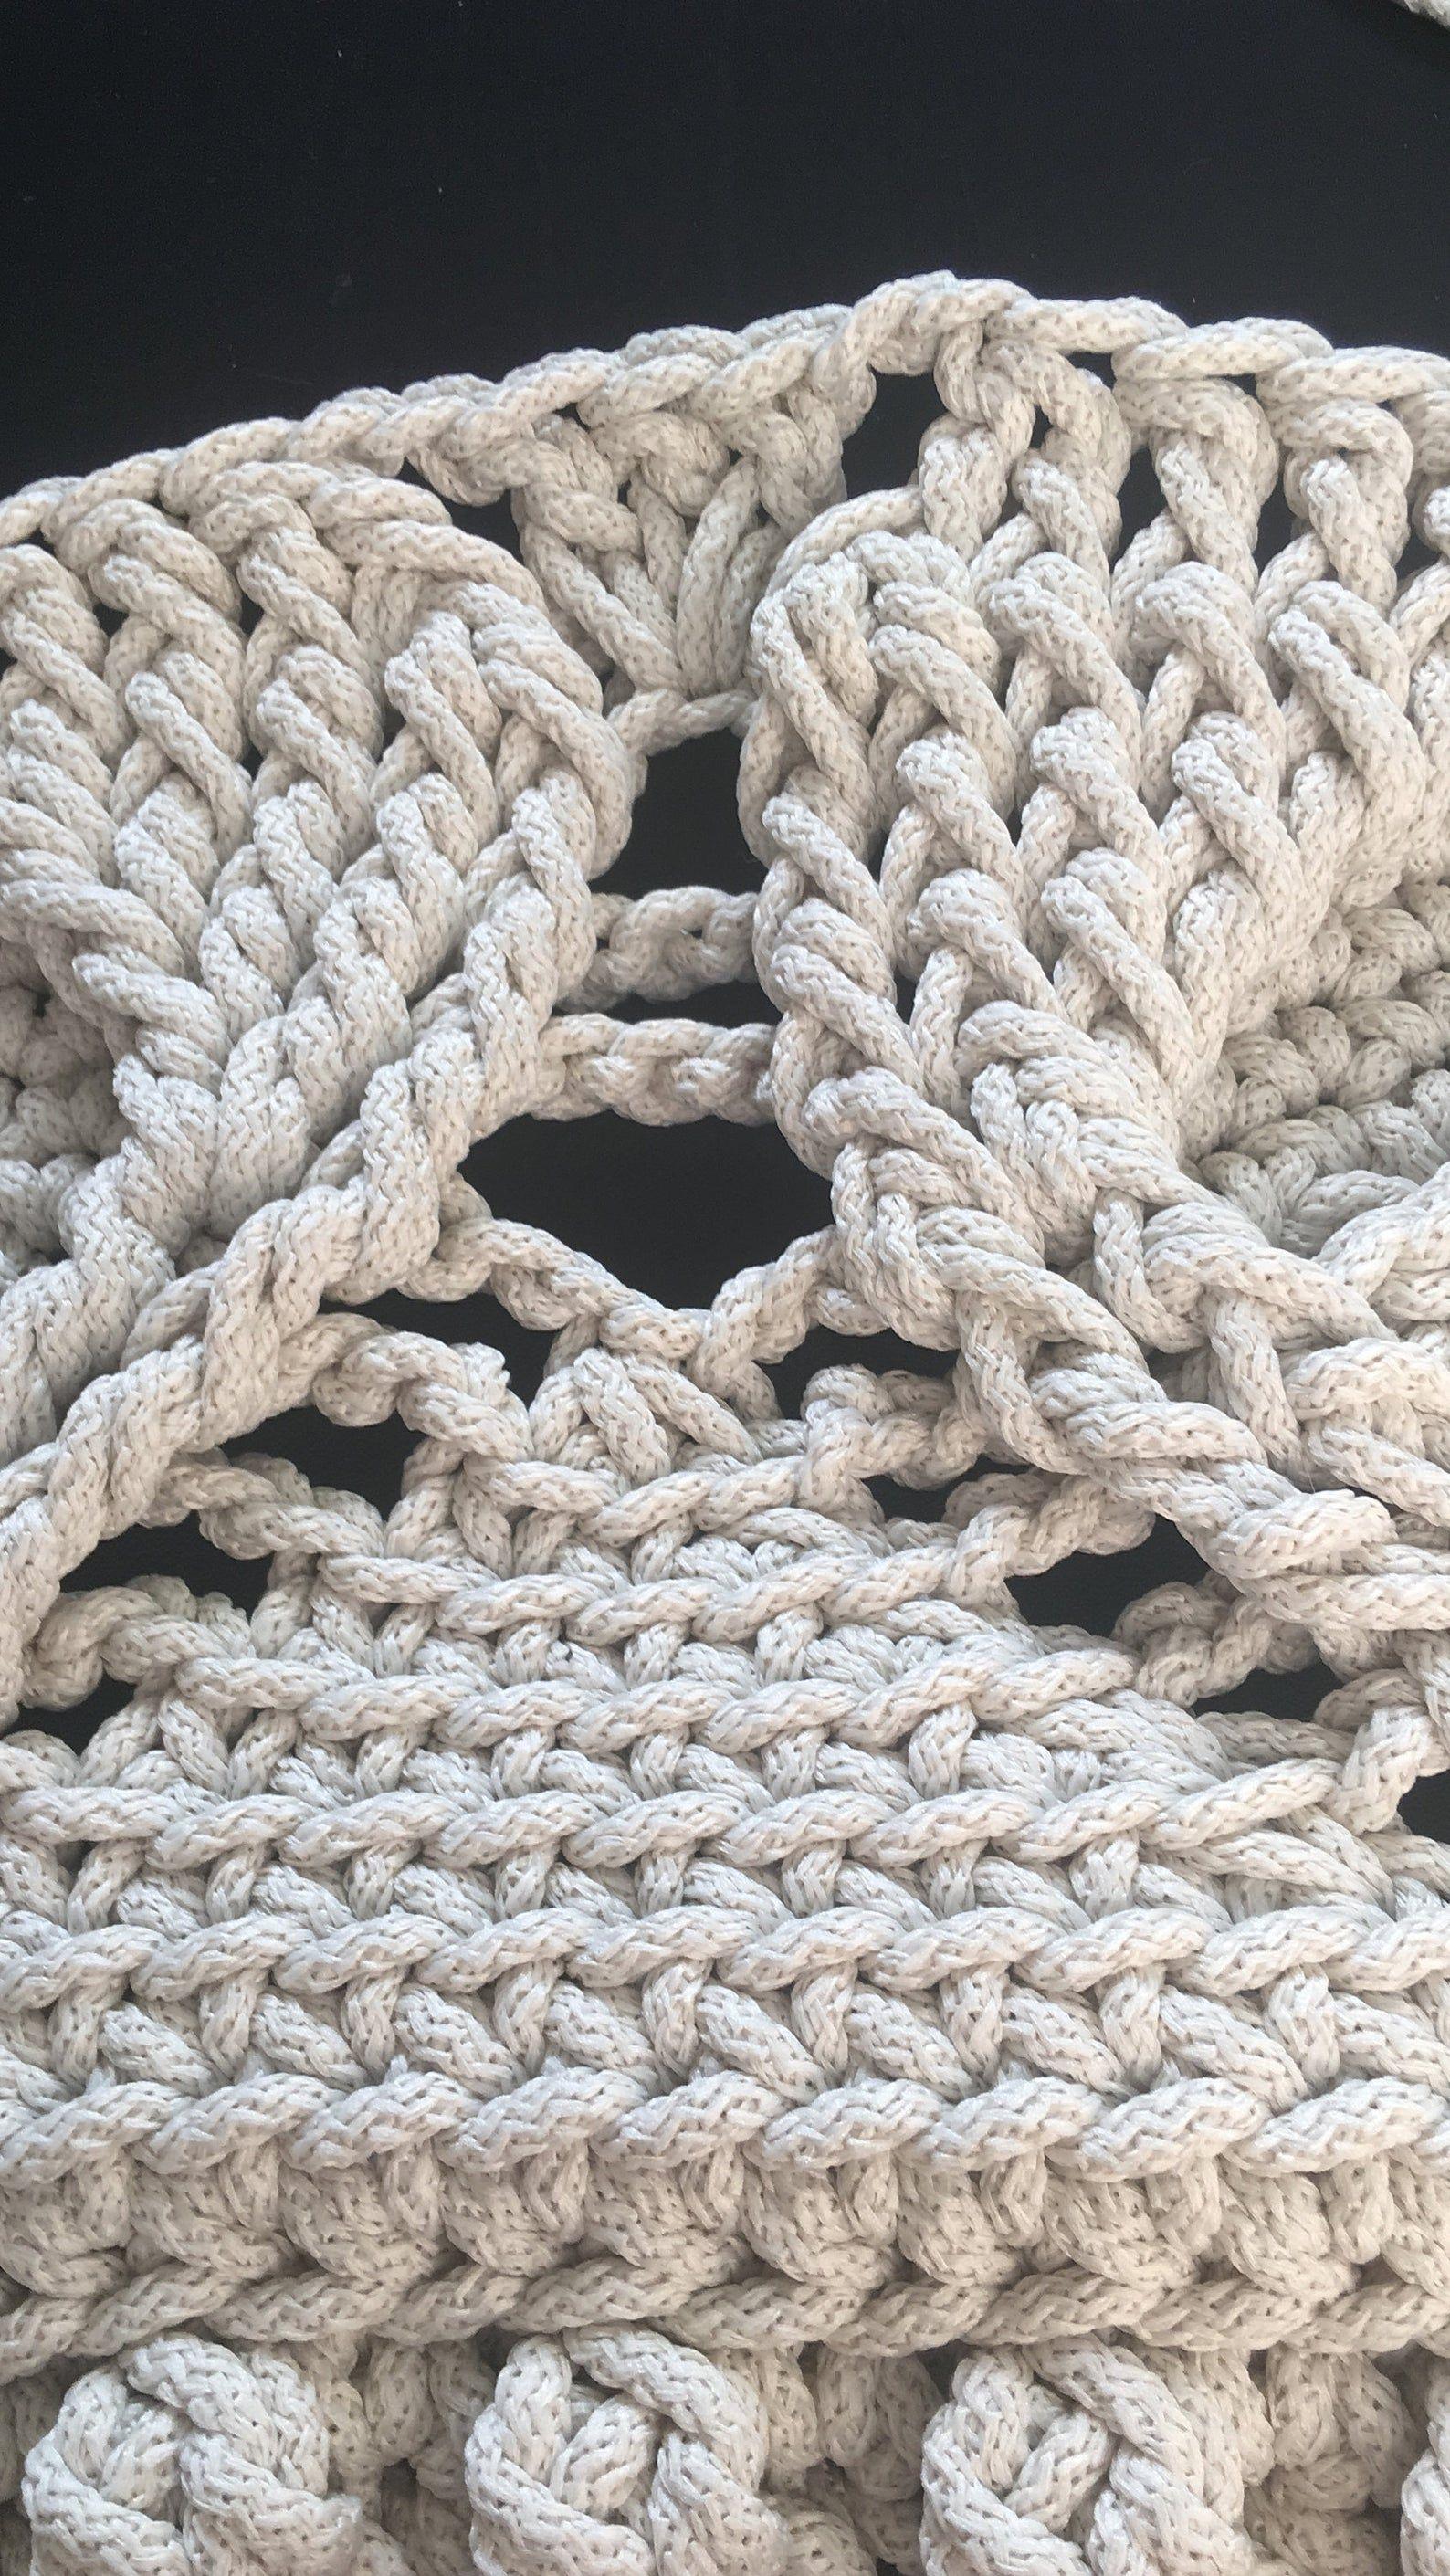 Video Tutorial Crocheting Rug Fox Text Description In Etsy In 2020 Videos Tutorial Crochet Crochet Rug